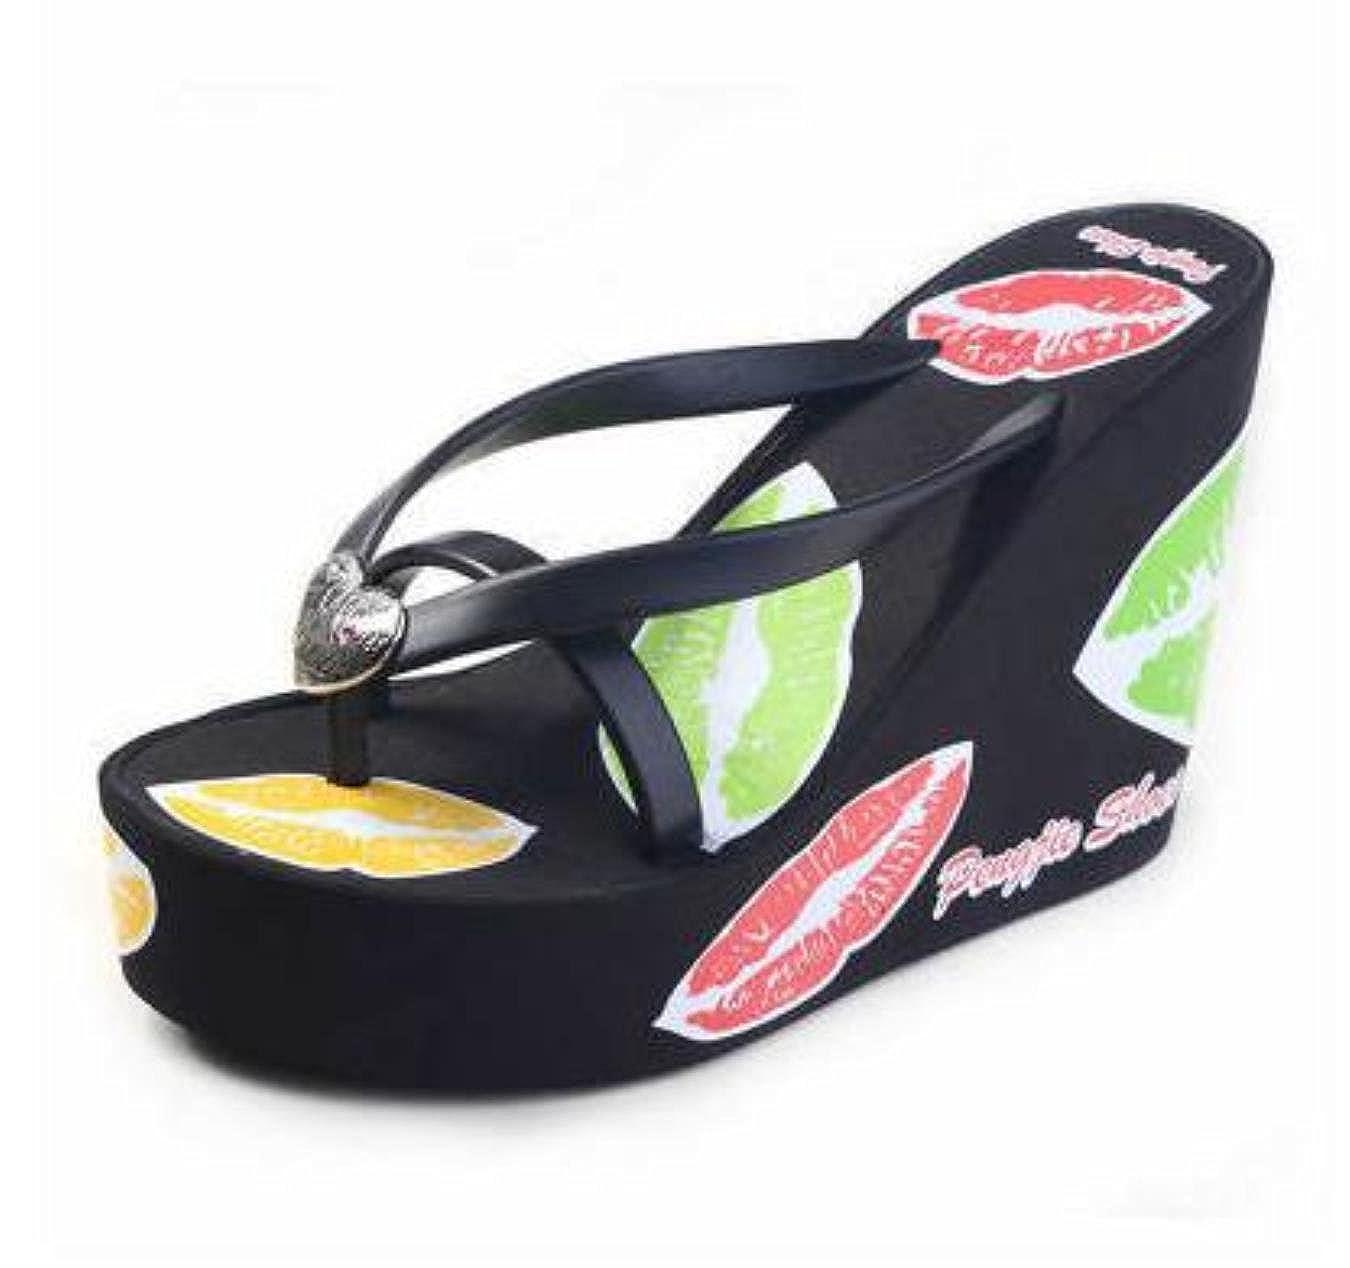 479a7899d8fad Amazon.com  Wedges Platform Women Comfortable Print High Heels Foam  Slippers Female Summer Flip Flops Beach Sandals  Clothing